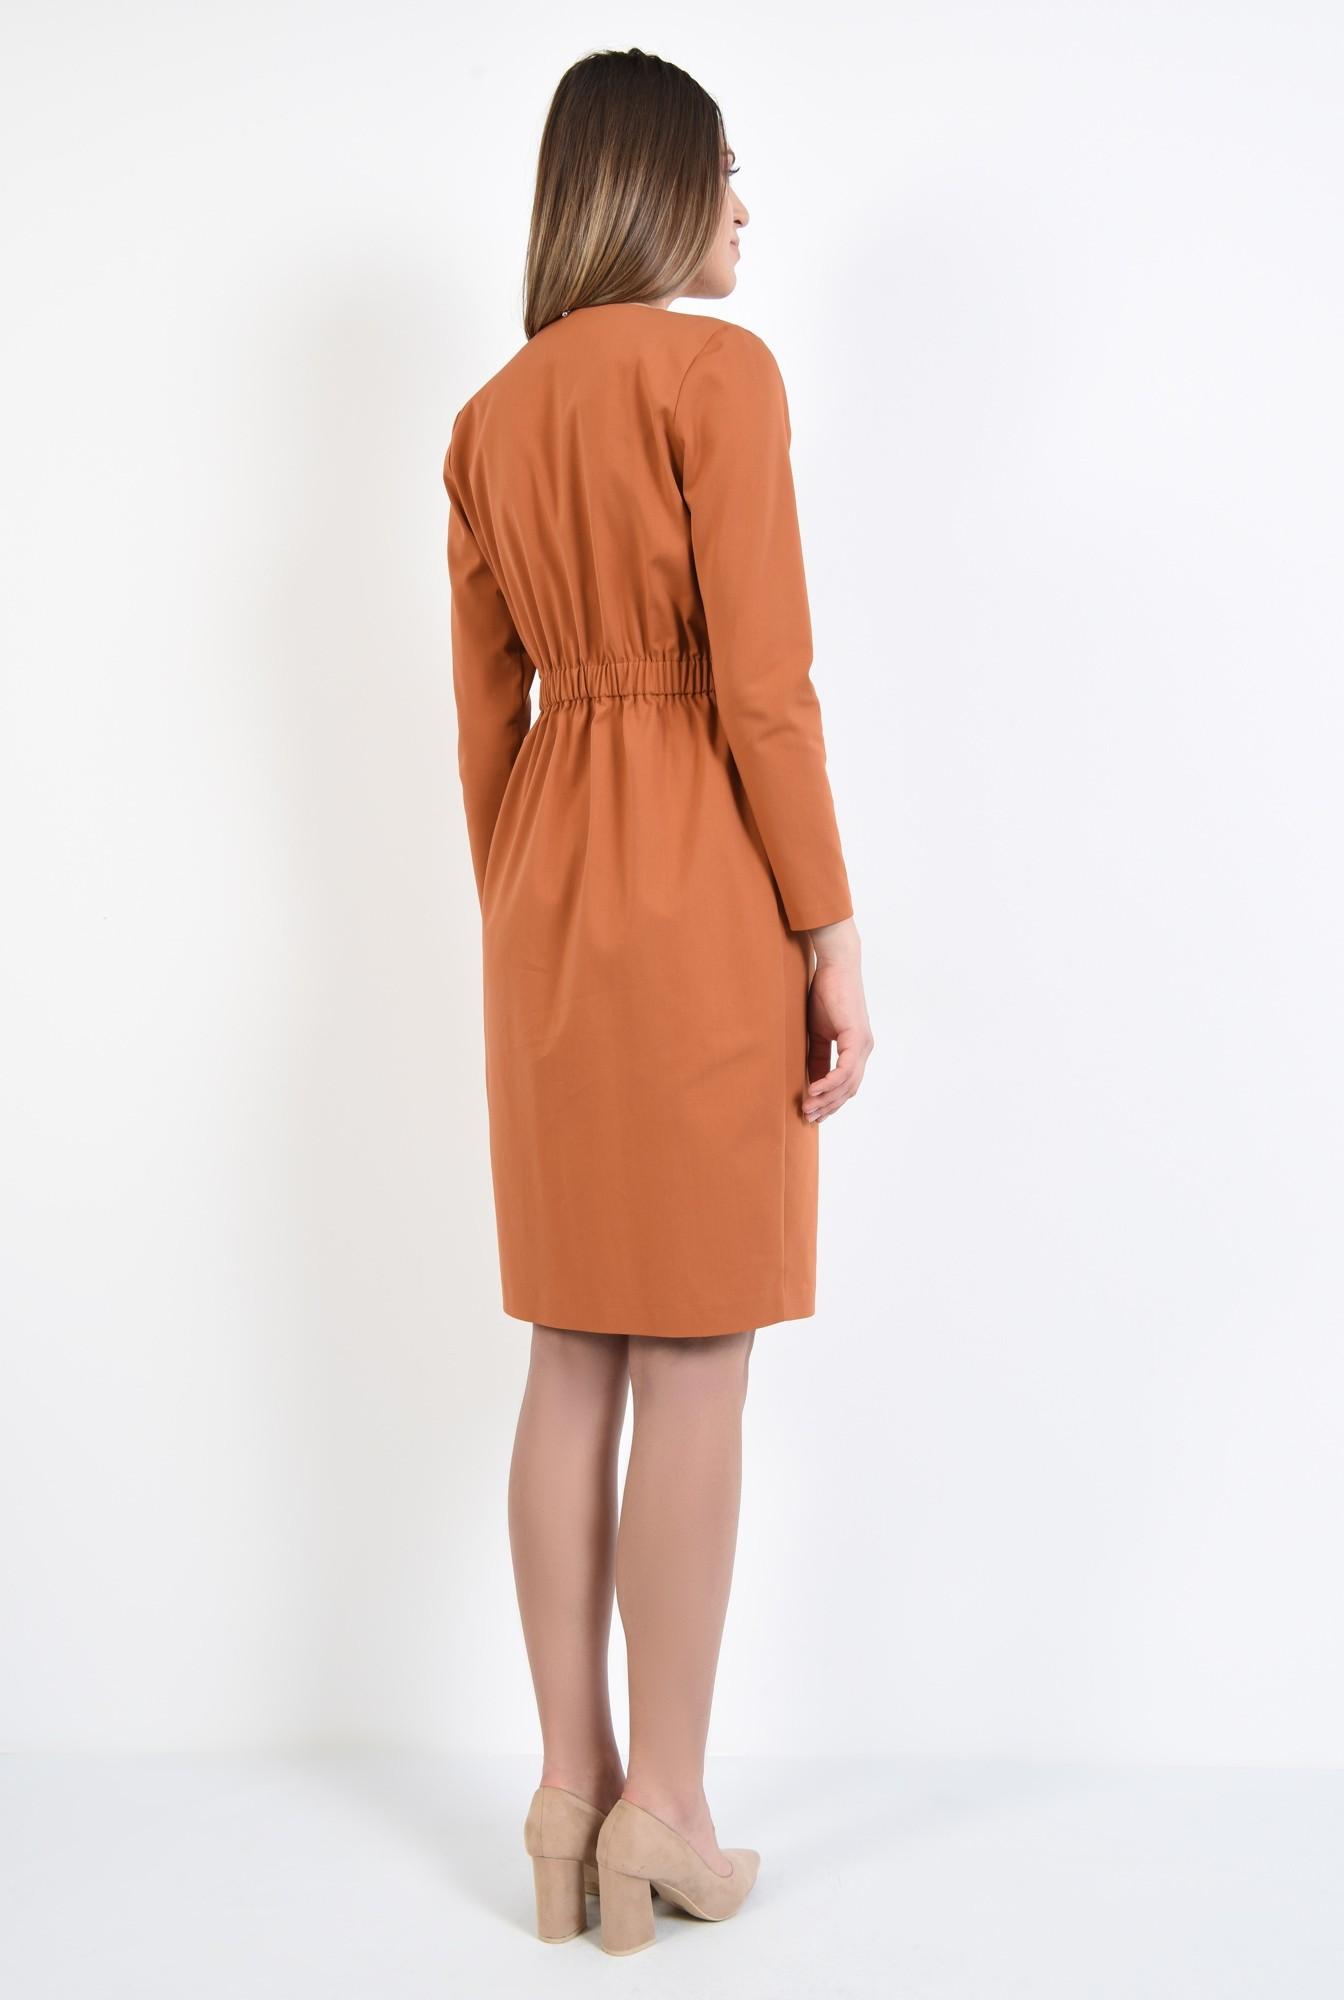 1 - rochie office, caramizie, anchior, doua randuri de nasturi